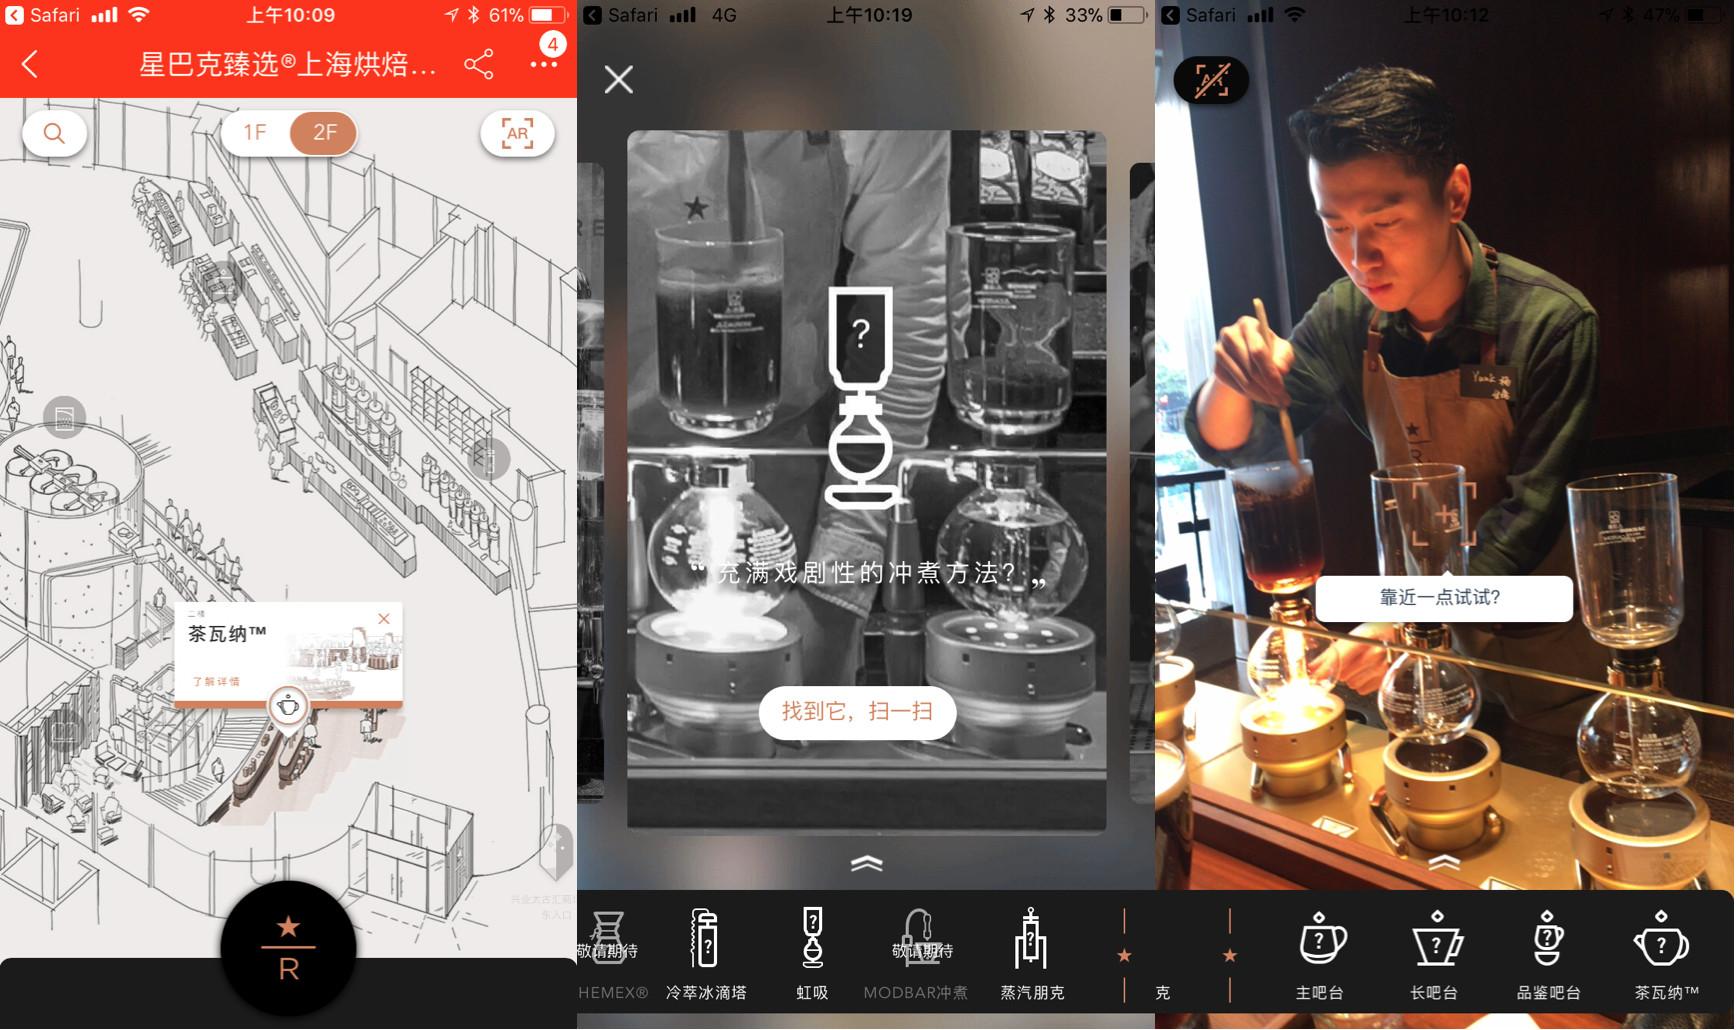 Starbucks-Roastery-Shanghai-AR-1-credit-Eva-Yoo.jpg